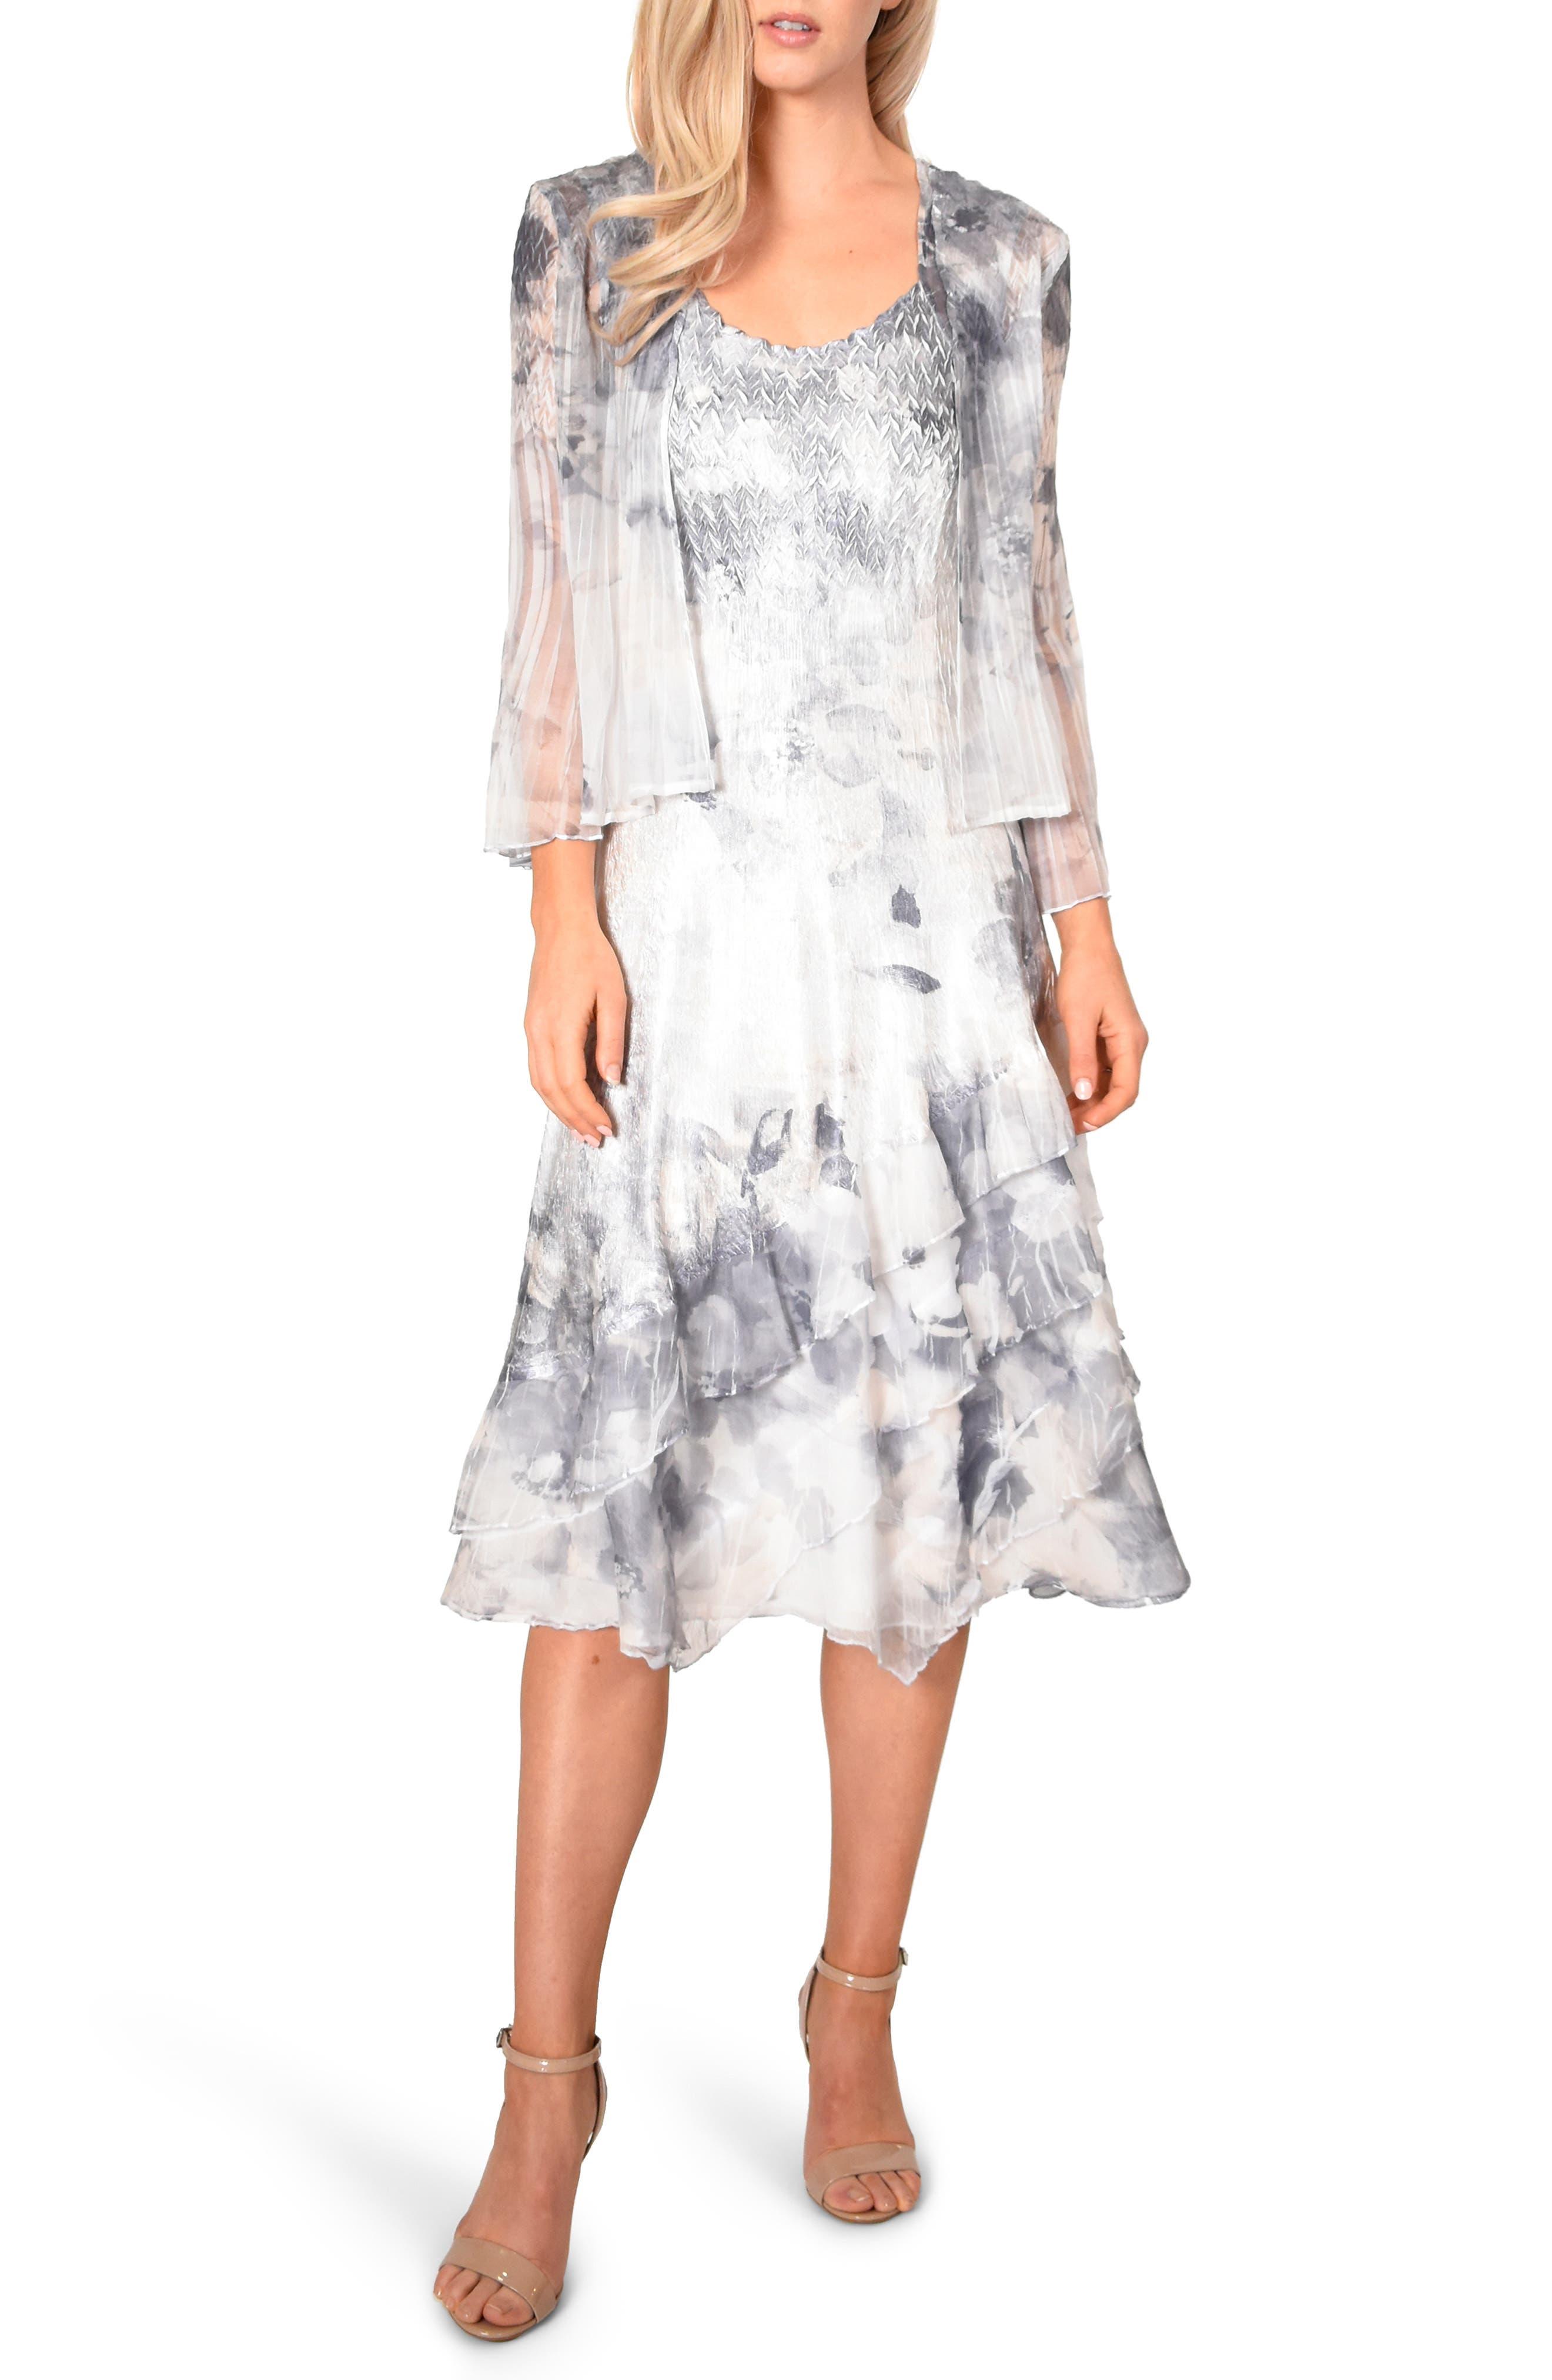 Petite Komarov Floral Charmeuse & Chiffon Dress With Jacket, Ivory